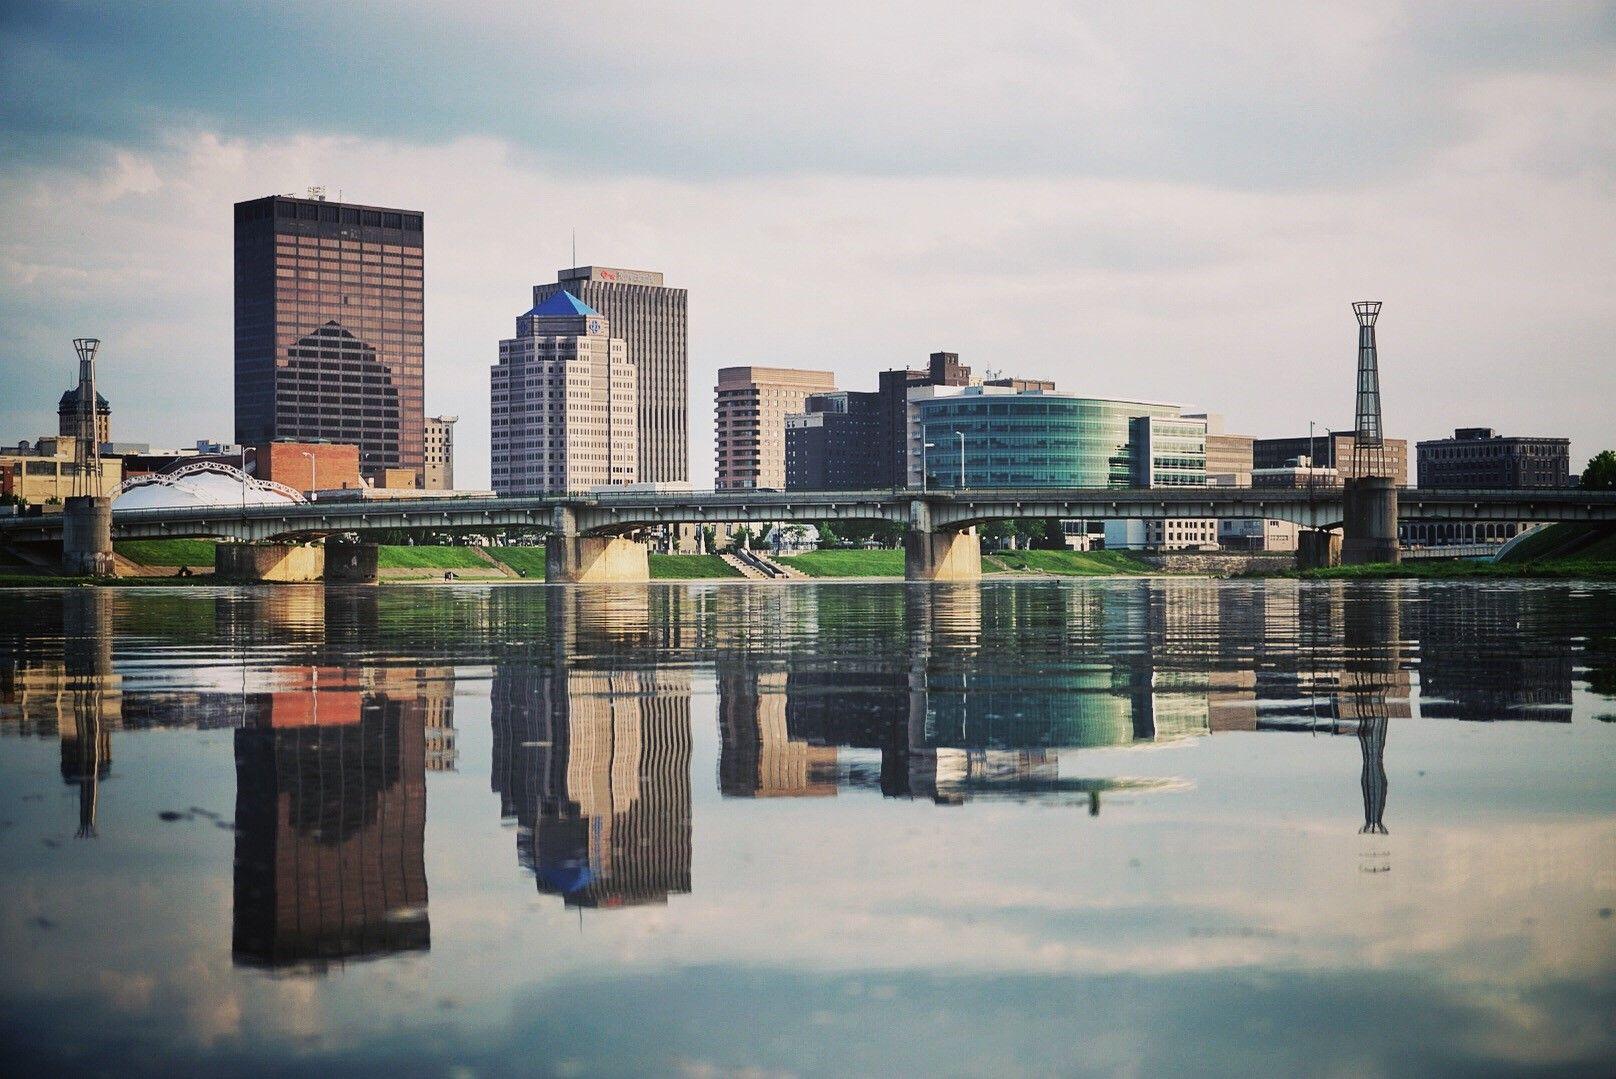 Dayton Ohio Skyline - From the Great Miami River [1616x1079][OC] | Ohio  skyline, Skyline, Dayton ohio